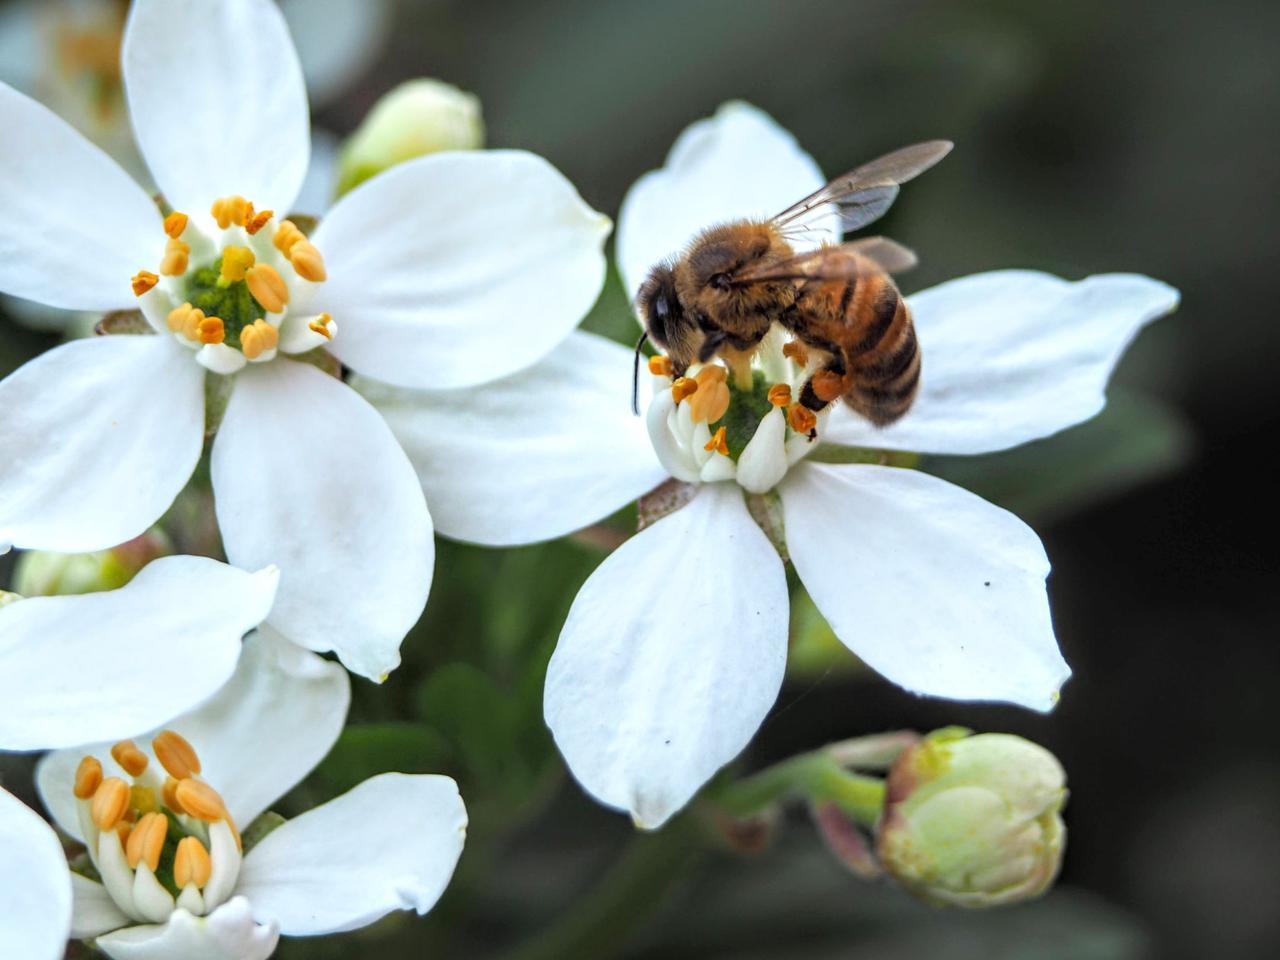 Bees pollinating the white flowers on a Choisya Ternata